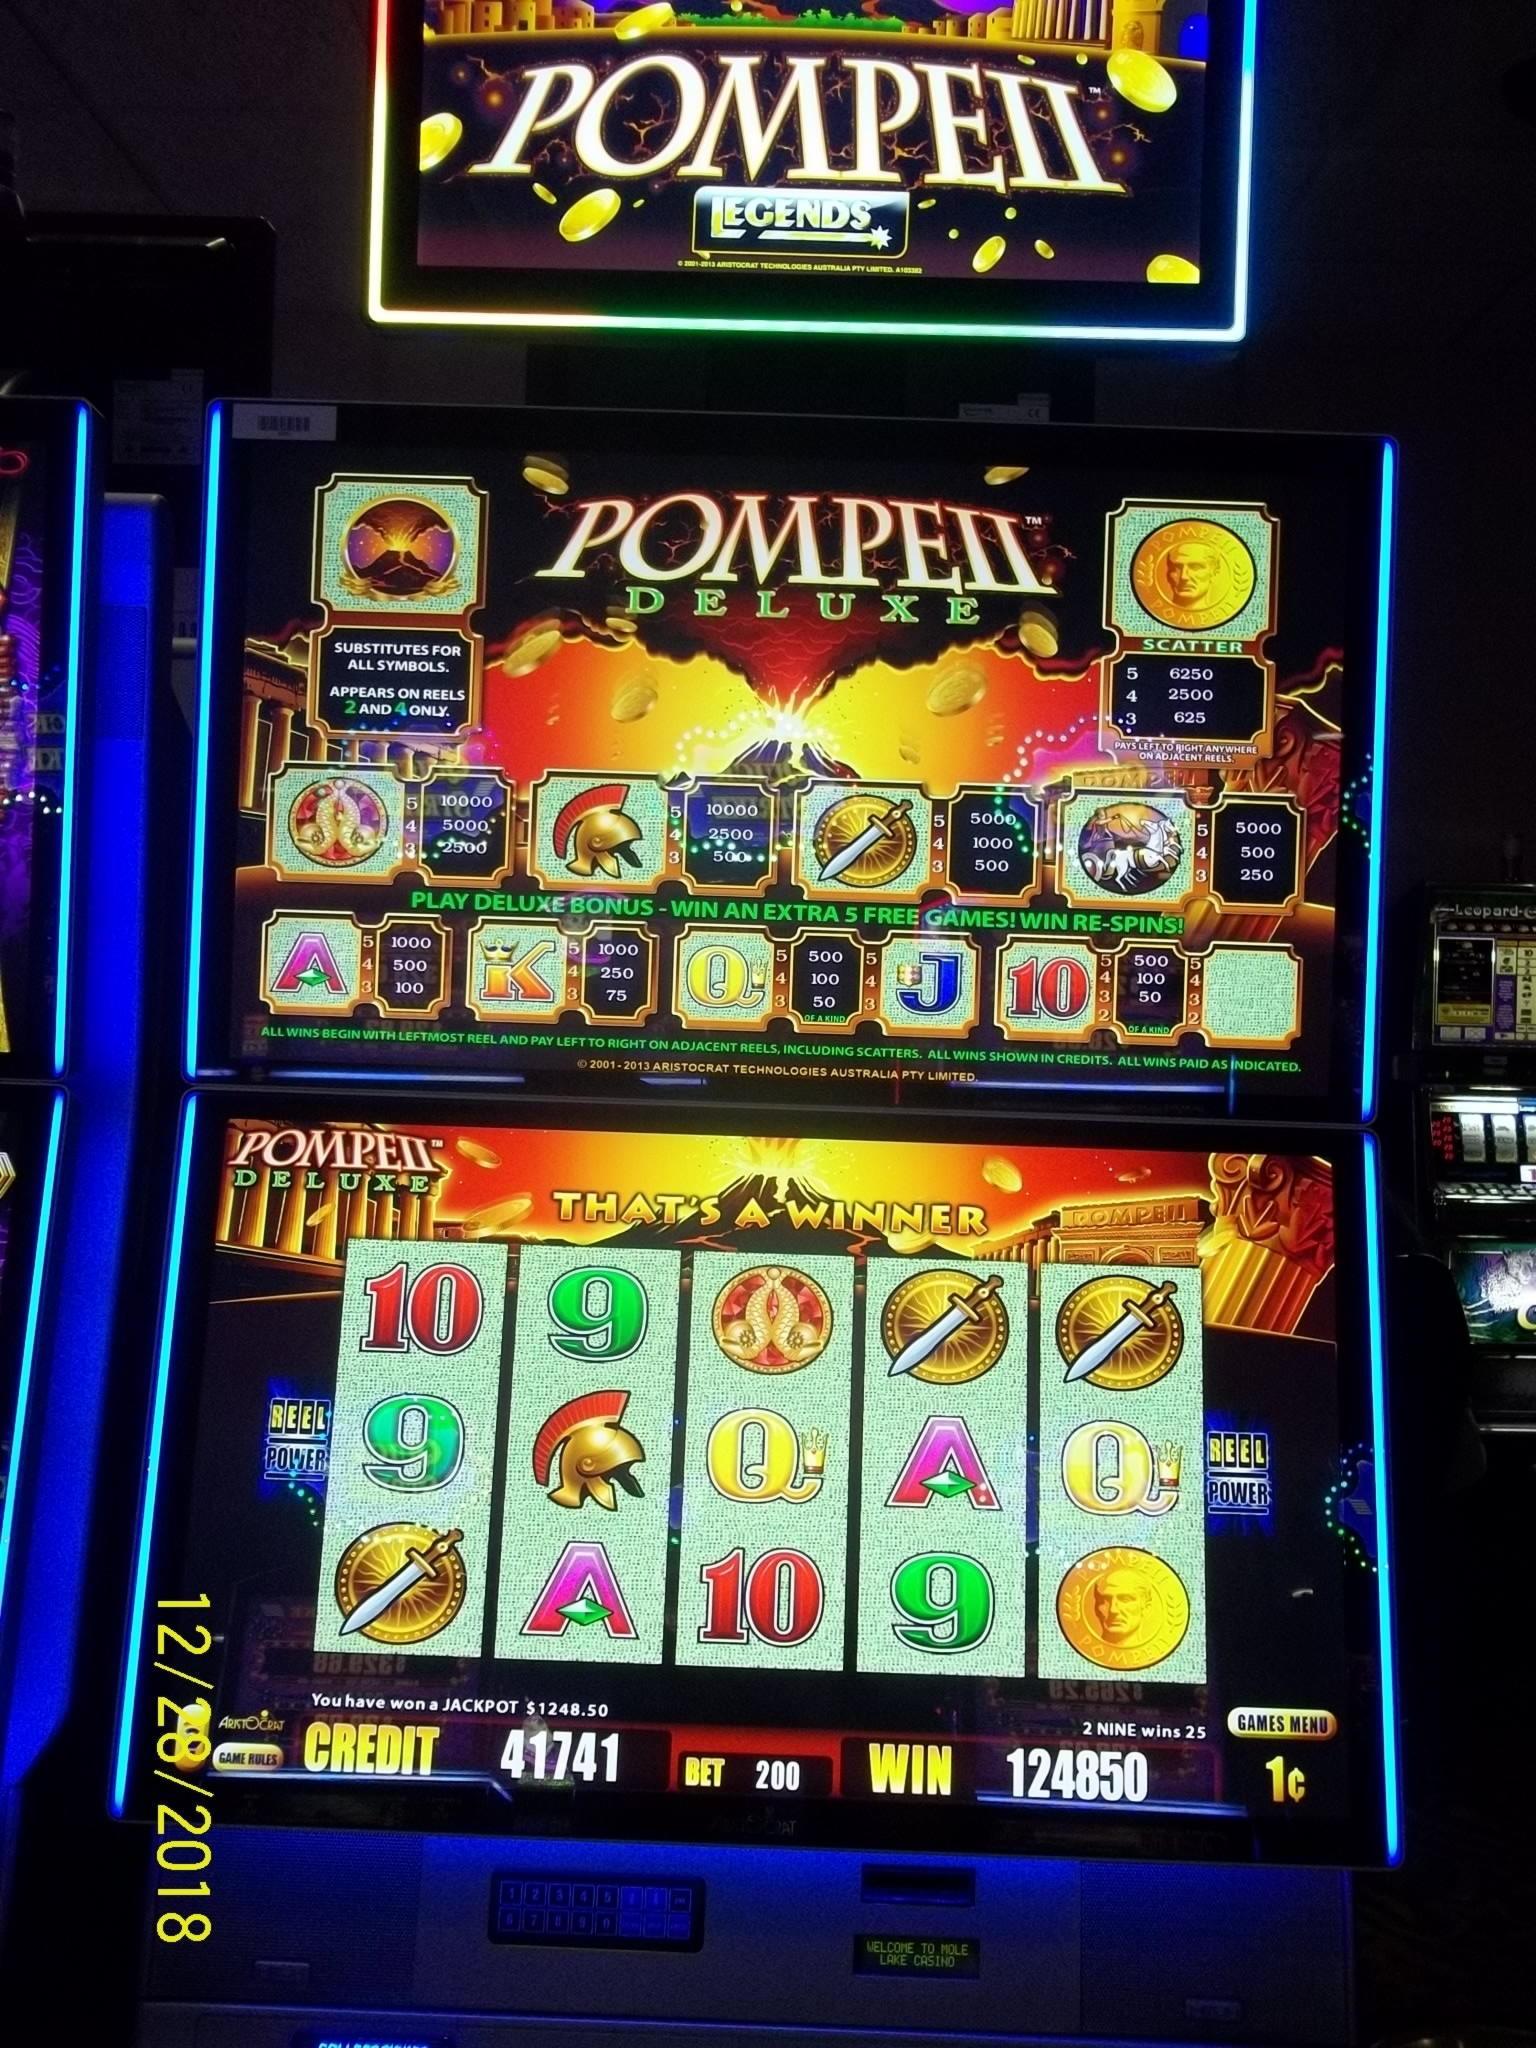 215 FREE SPINS sur le casino Big Dollar